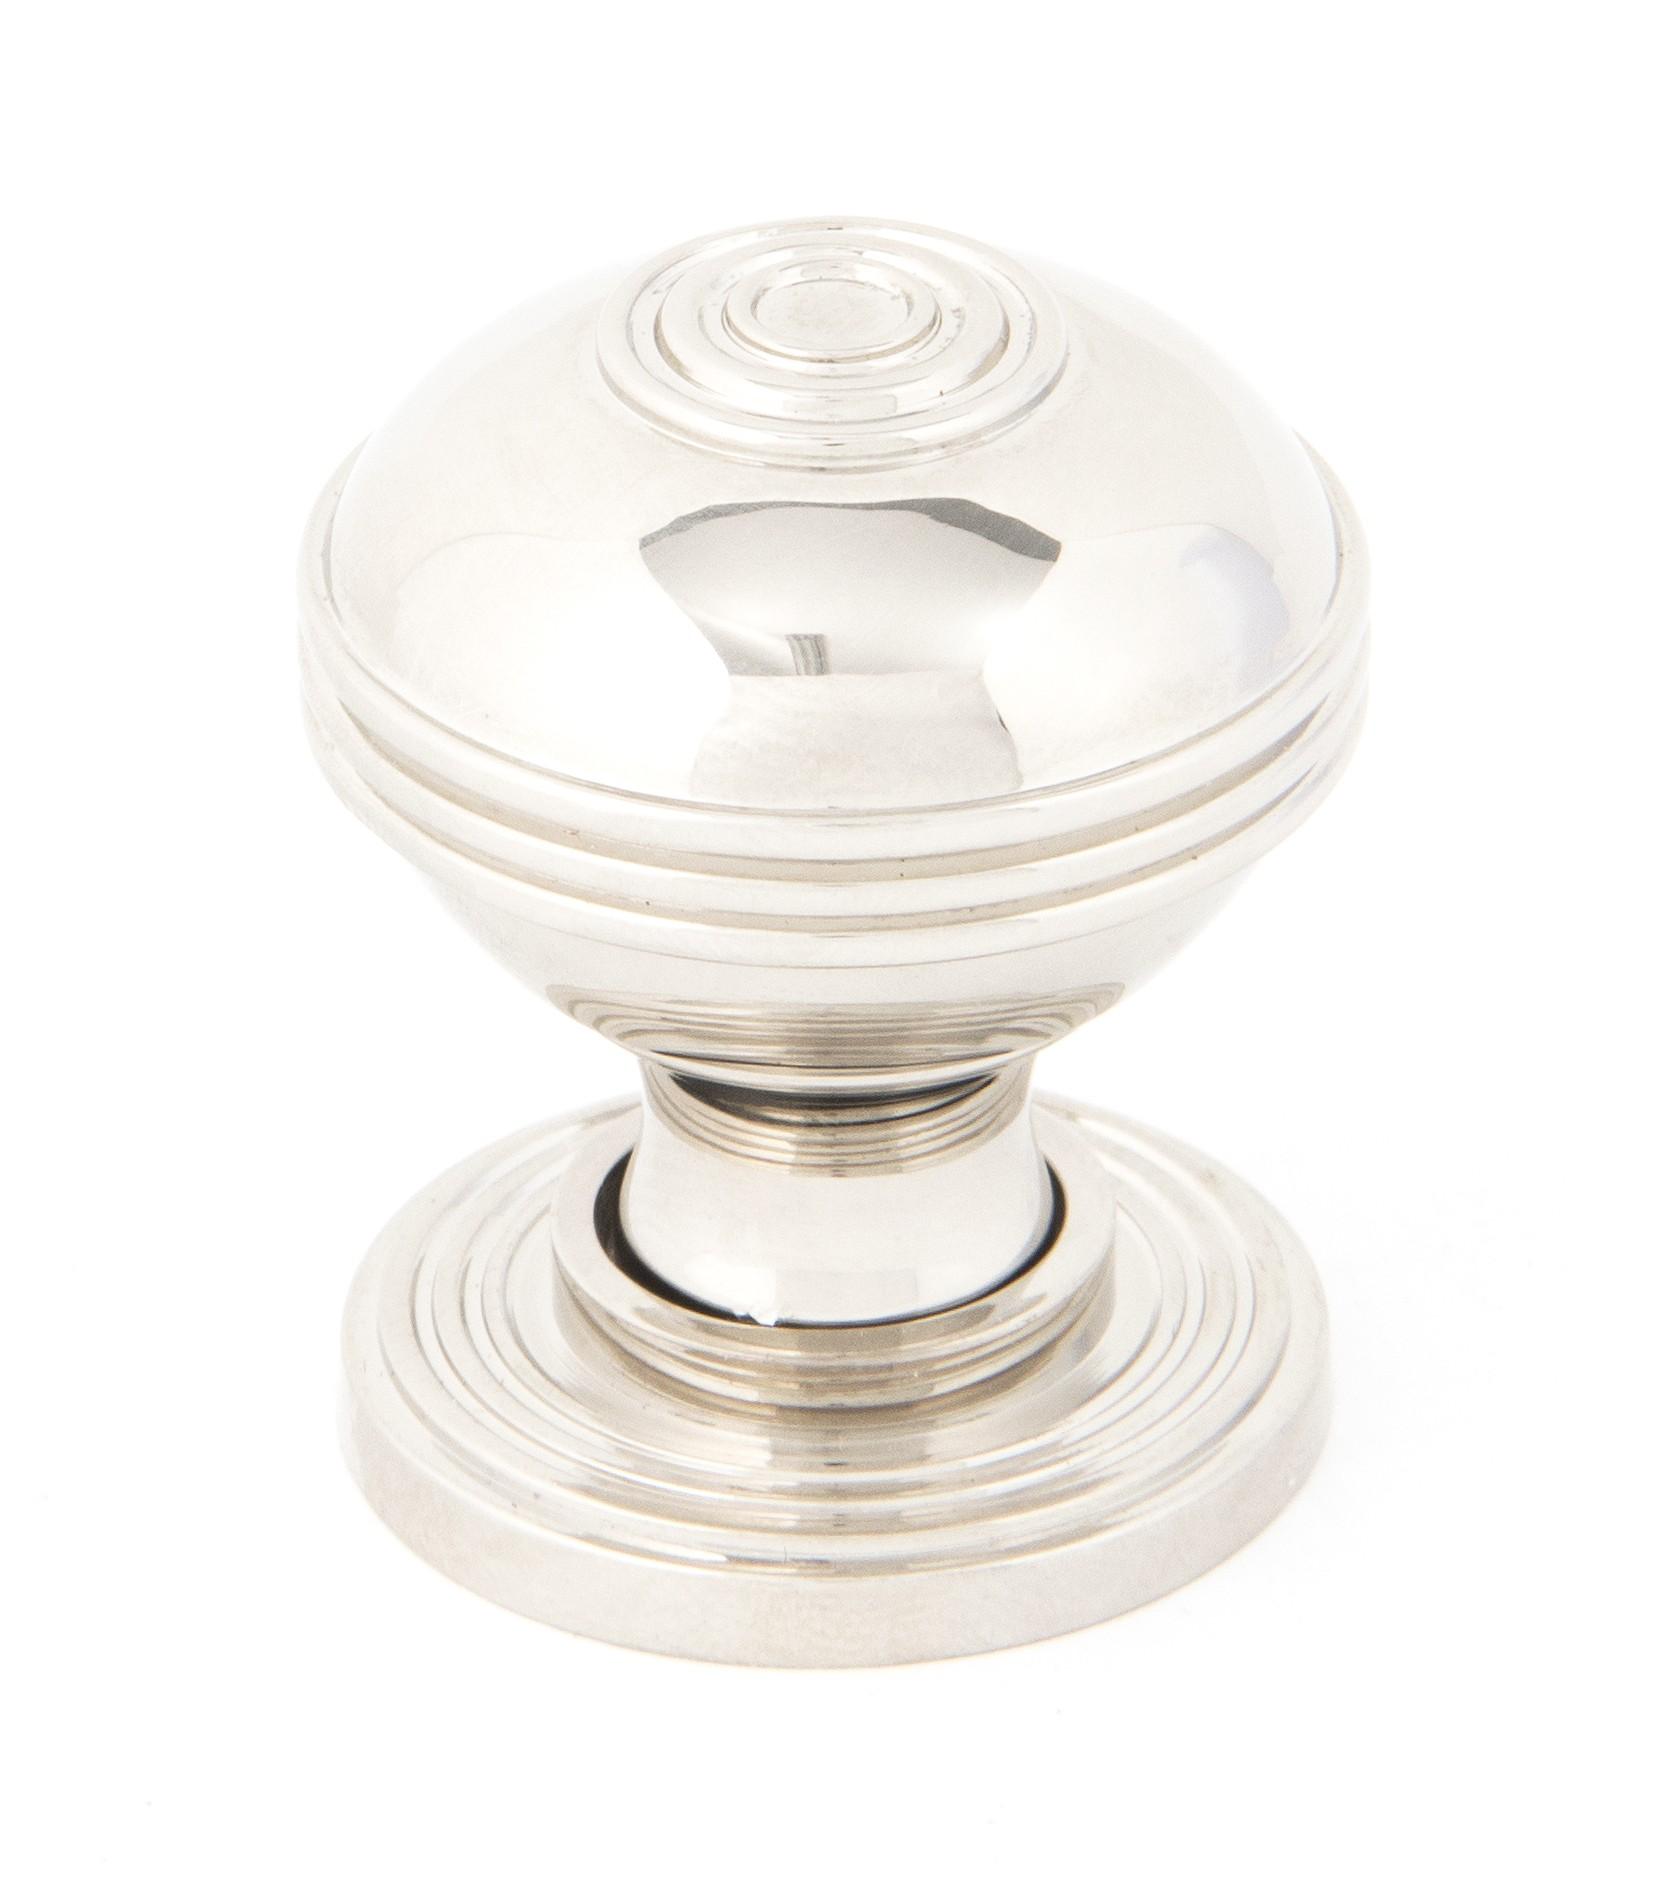 ANVIL - Polished Nickel Prestbury Cabinet Knob - Small